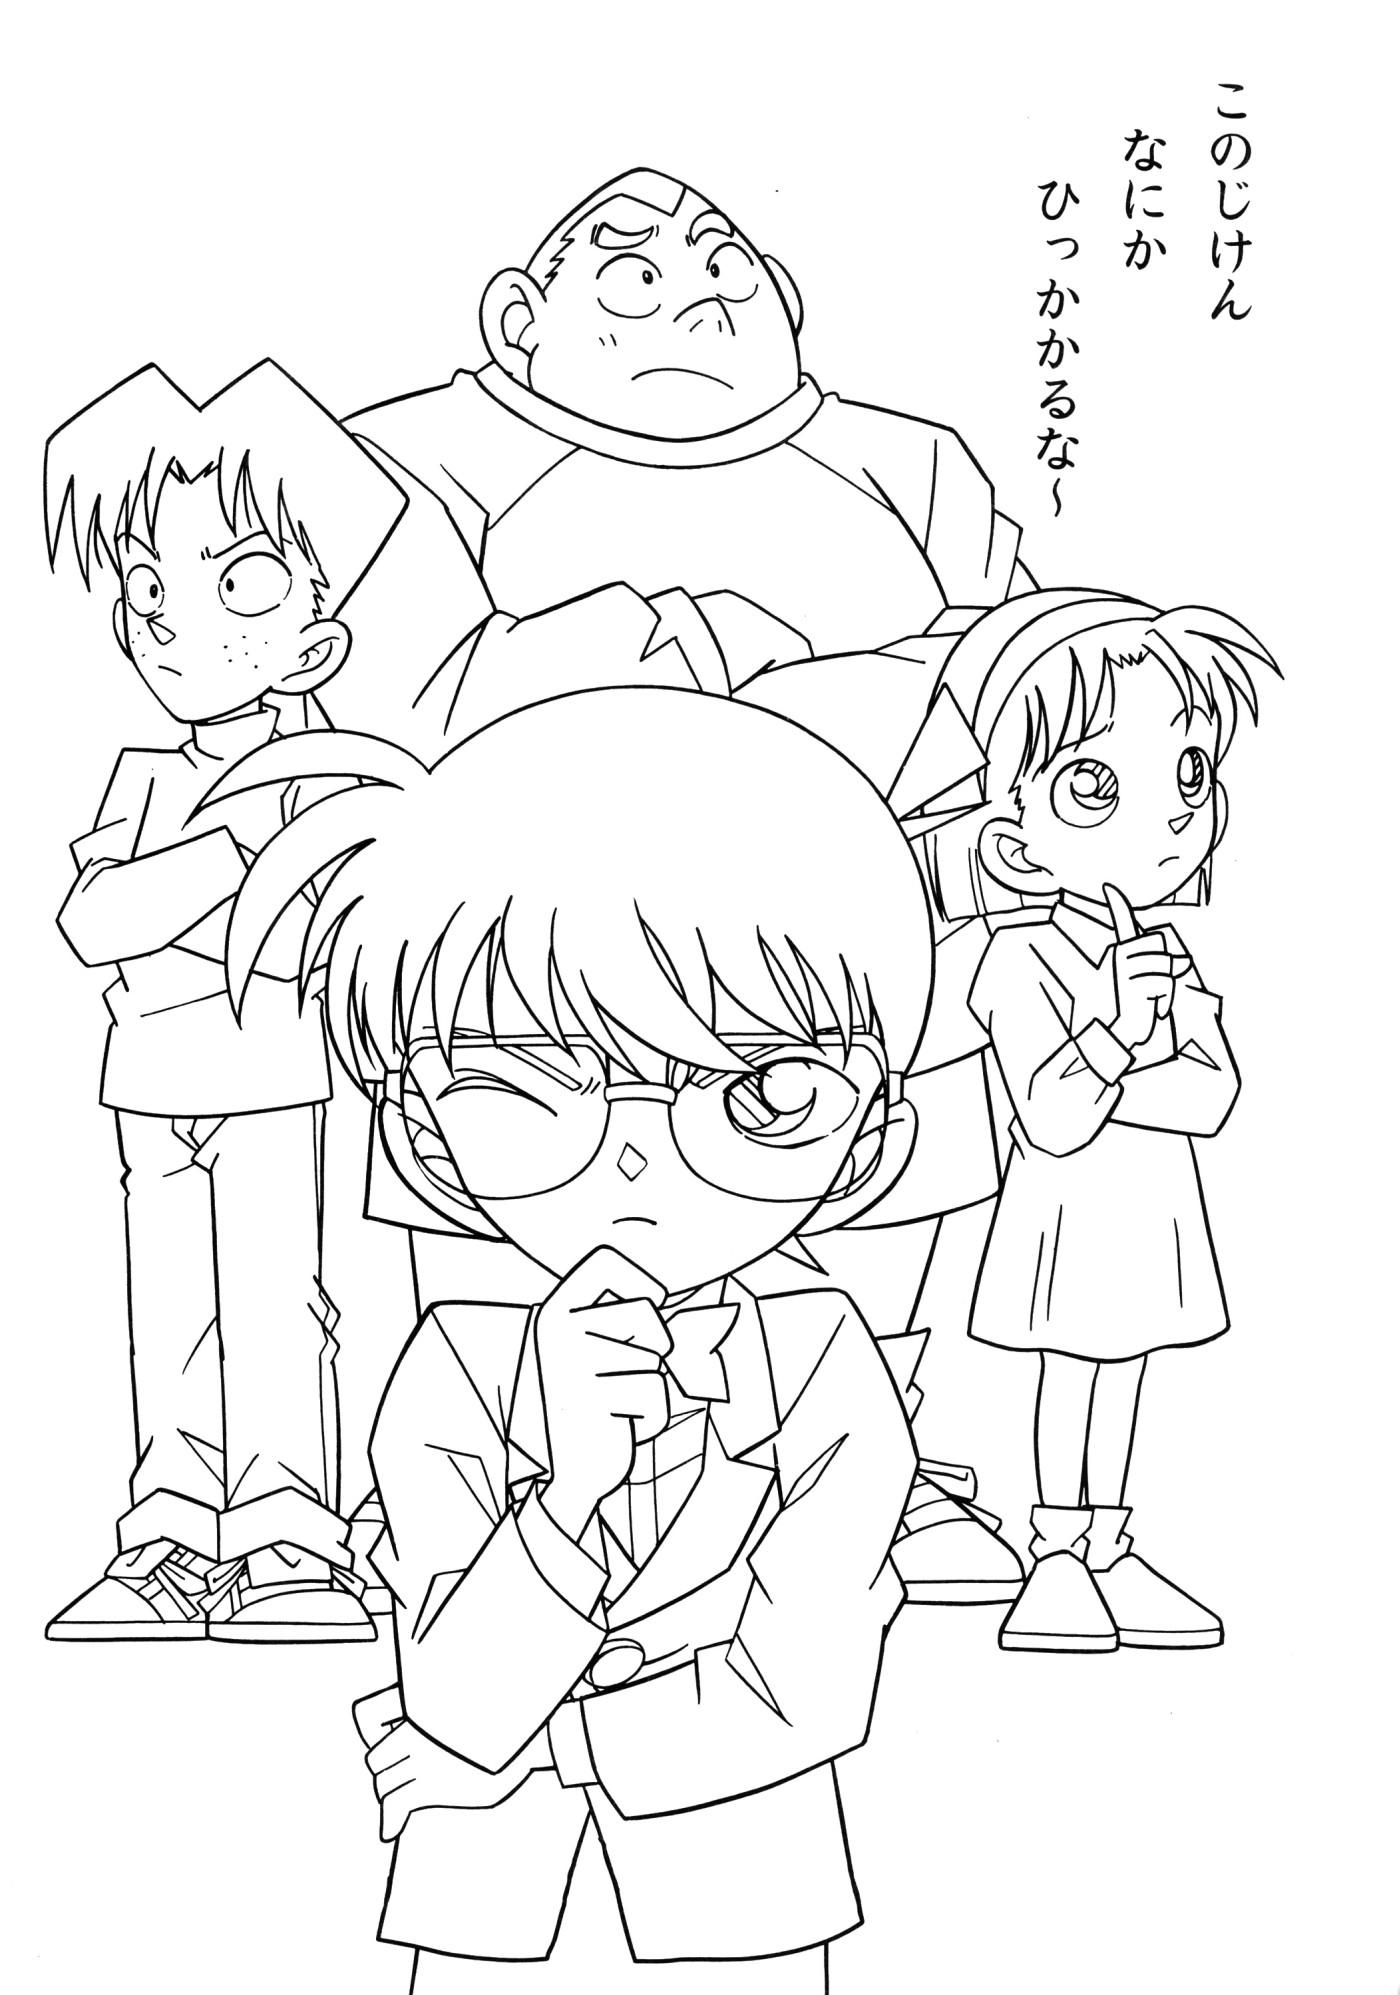 Uncategorized Detective Conan Coloring Pages detective conan coloring pages riley free printables riley